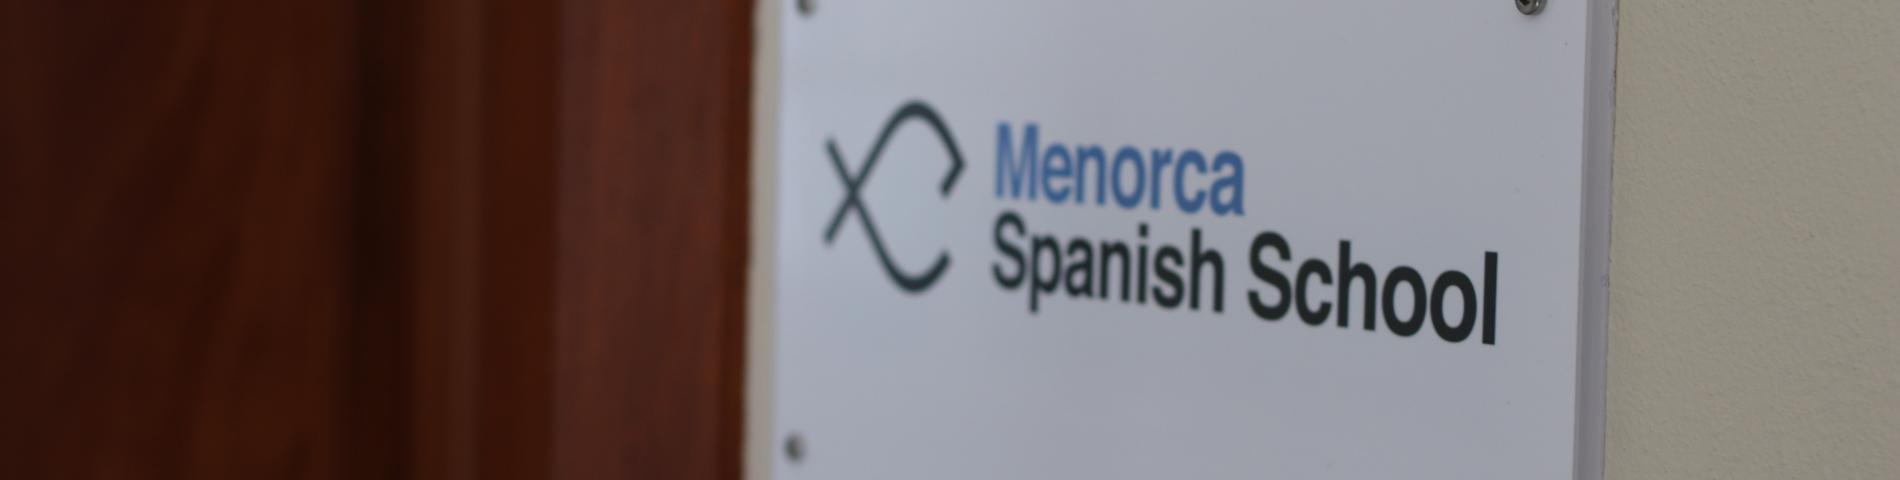 Menorca Spanish School图片1